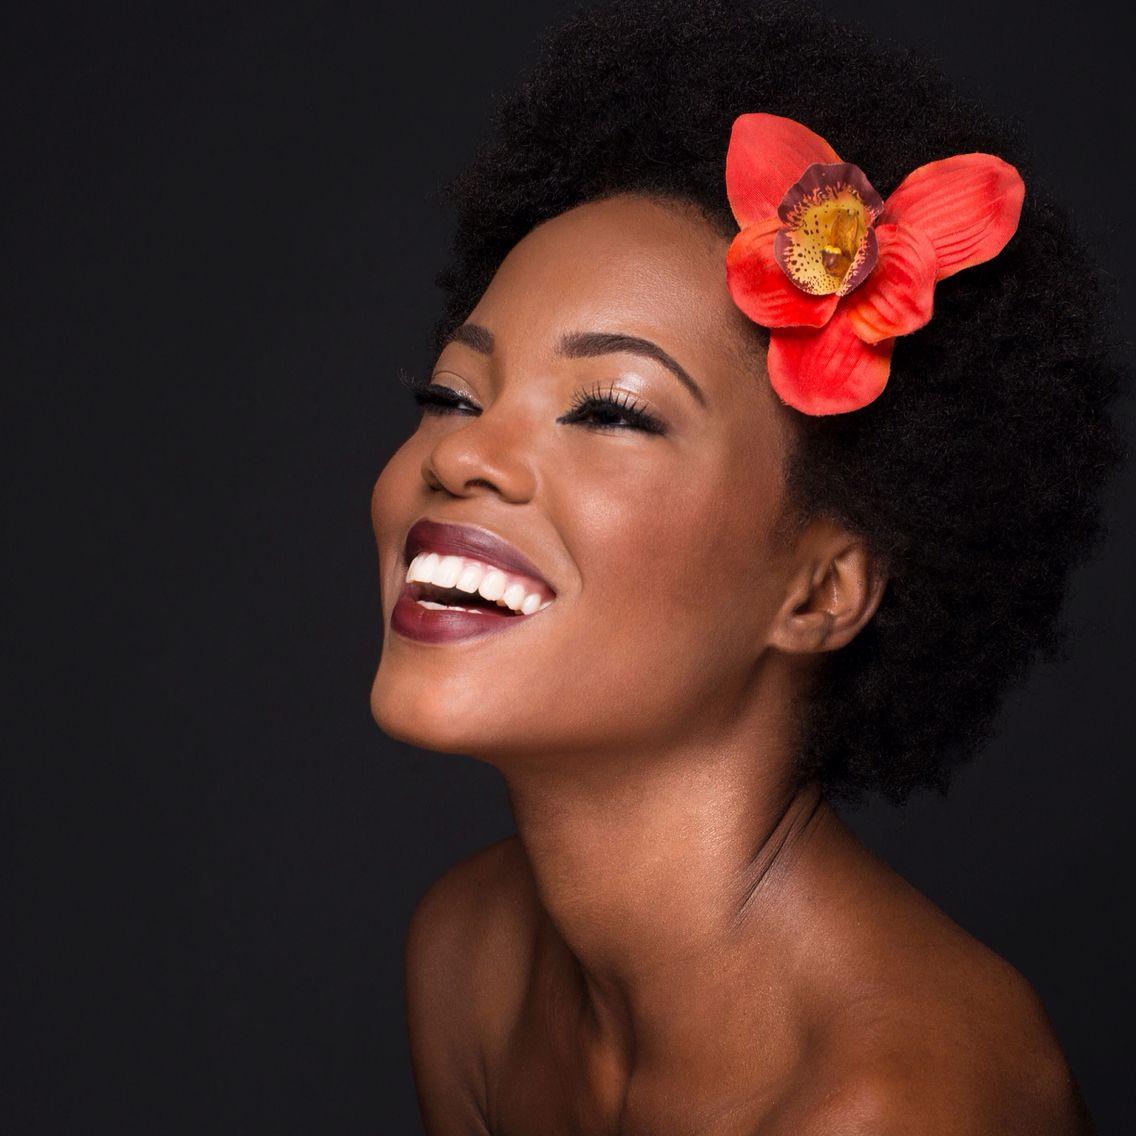 Natural hair, natural beauty, African American makeup